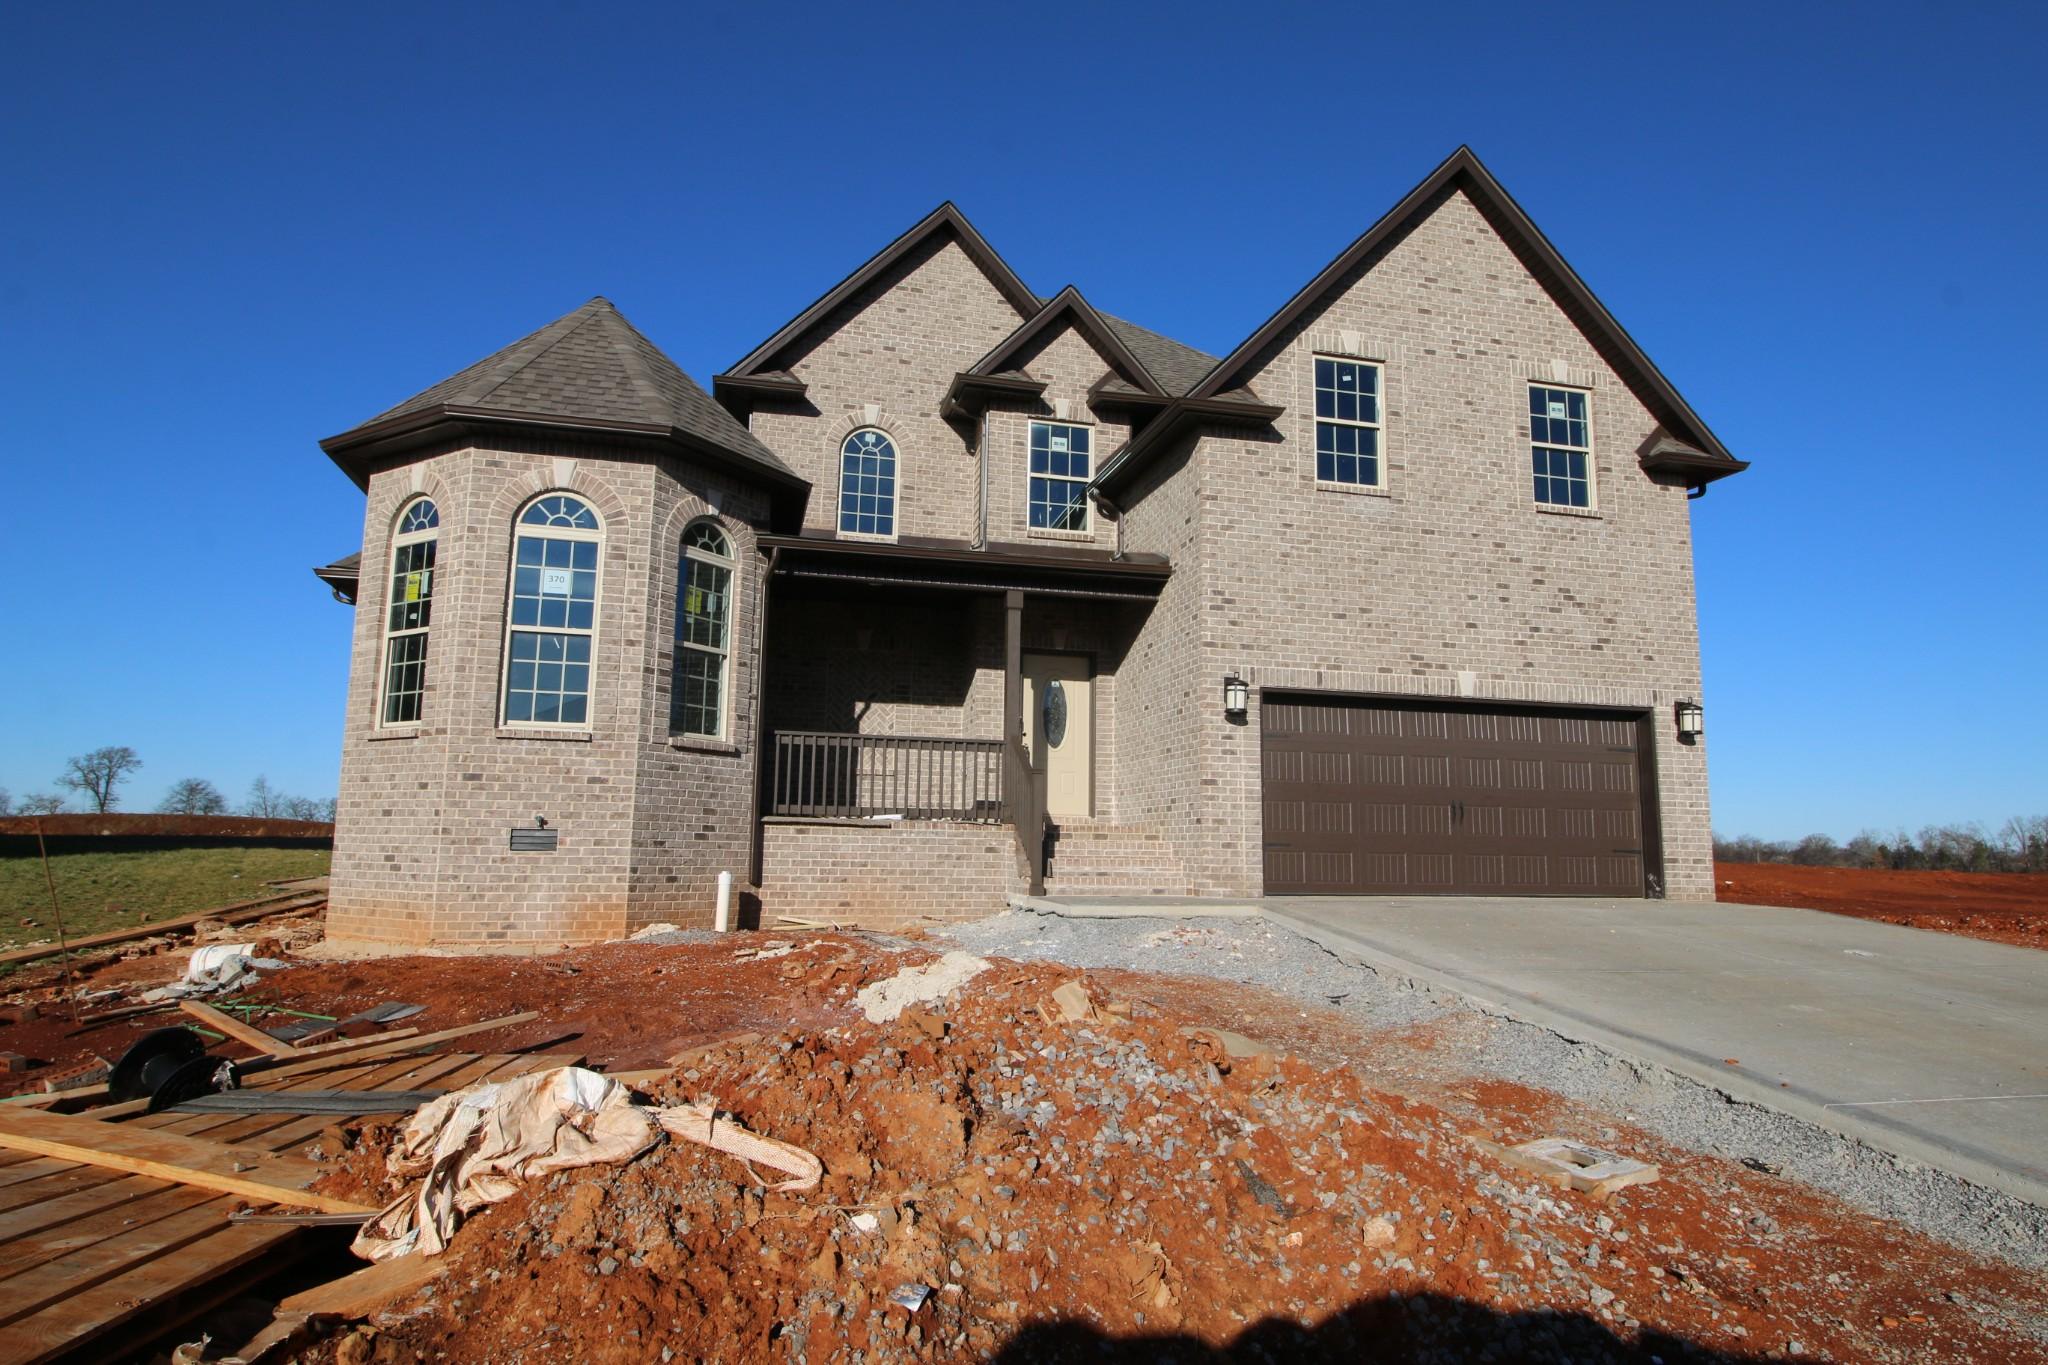 370 Summerfield, Clarksville, TN 37040 - Clarksville, TN real estate listing